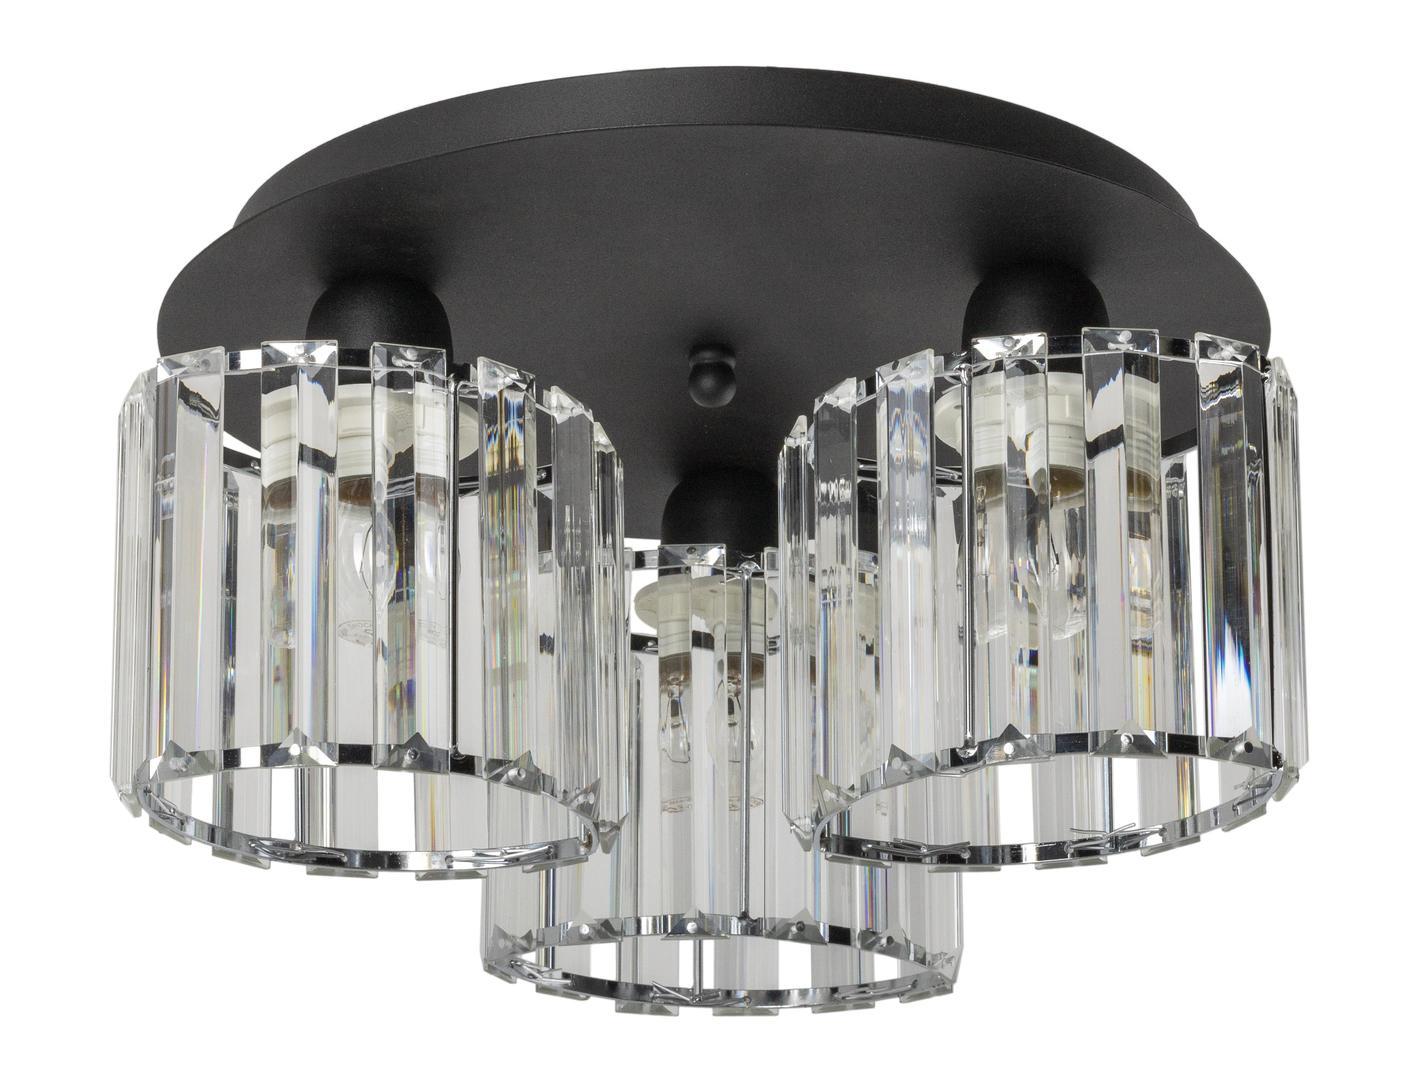 Dizajnérske stropné svietidlo Kowar 3